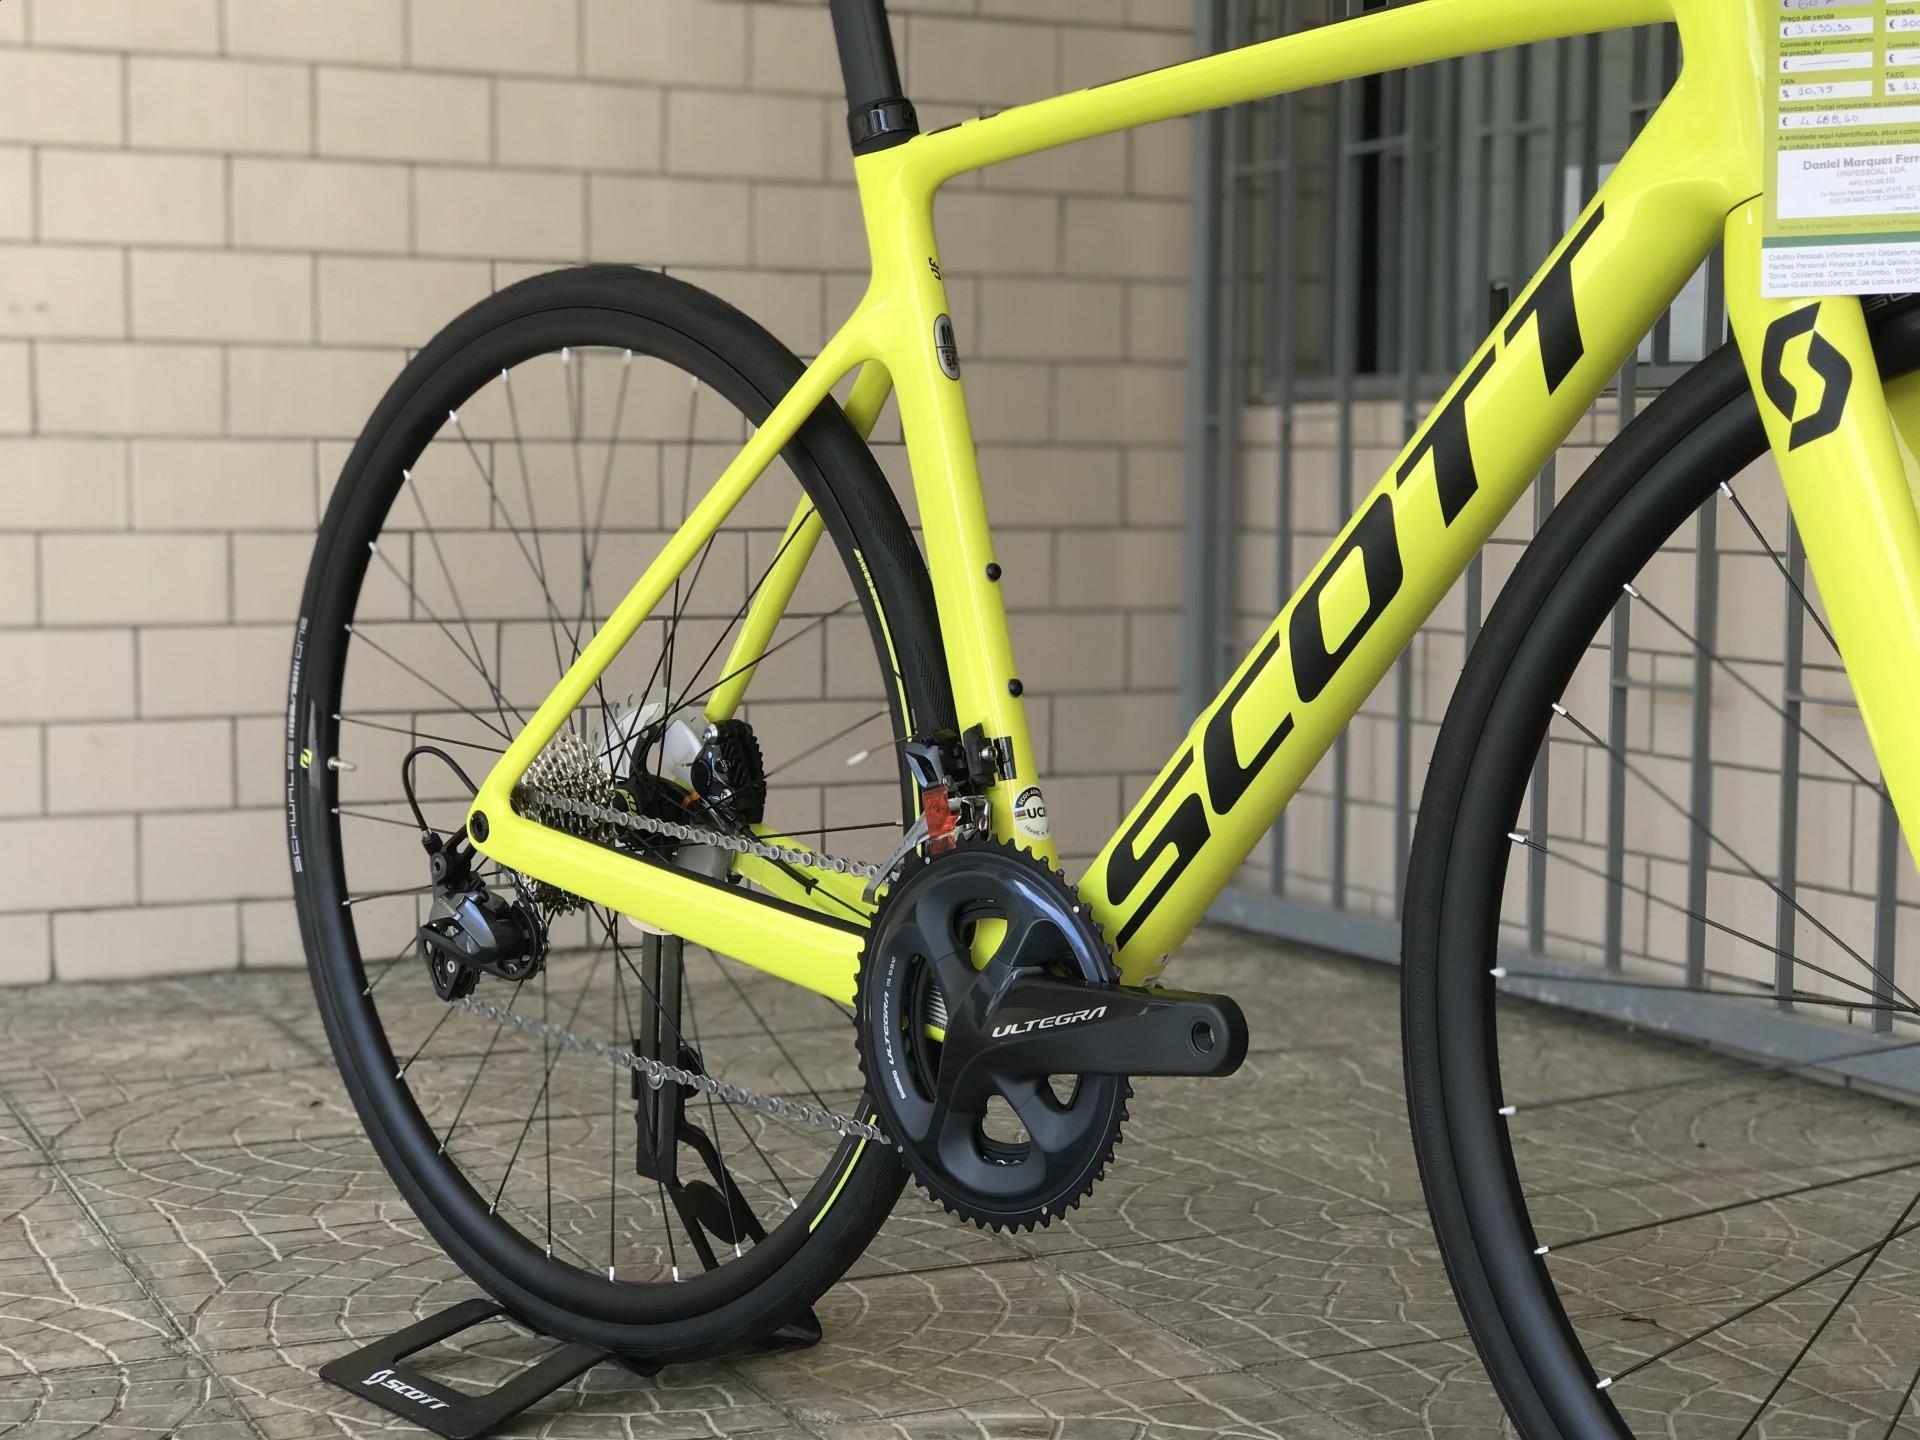 BICICLETA SCOTT ADDICT RC 30 YELLOW - 2020